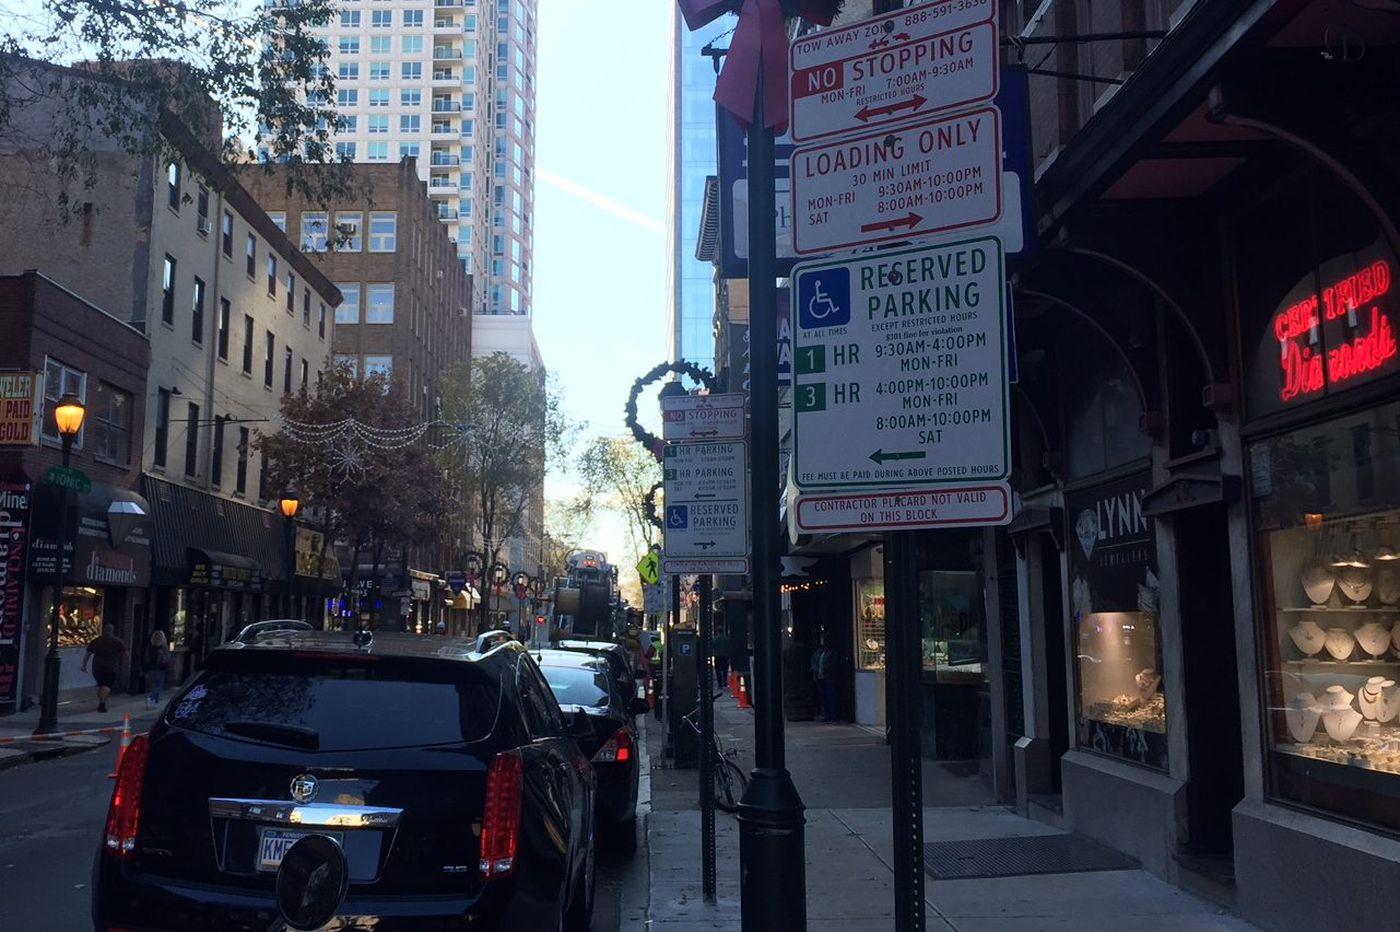 Where to park in Philadelphia